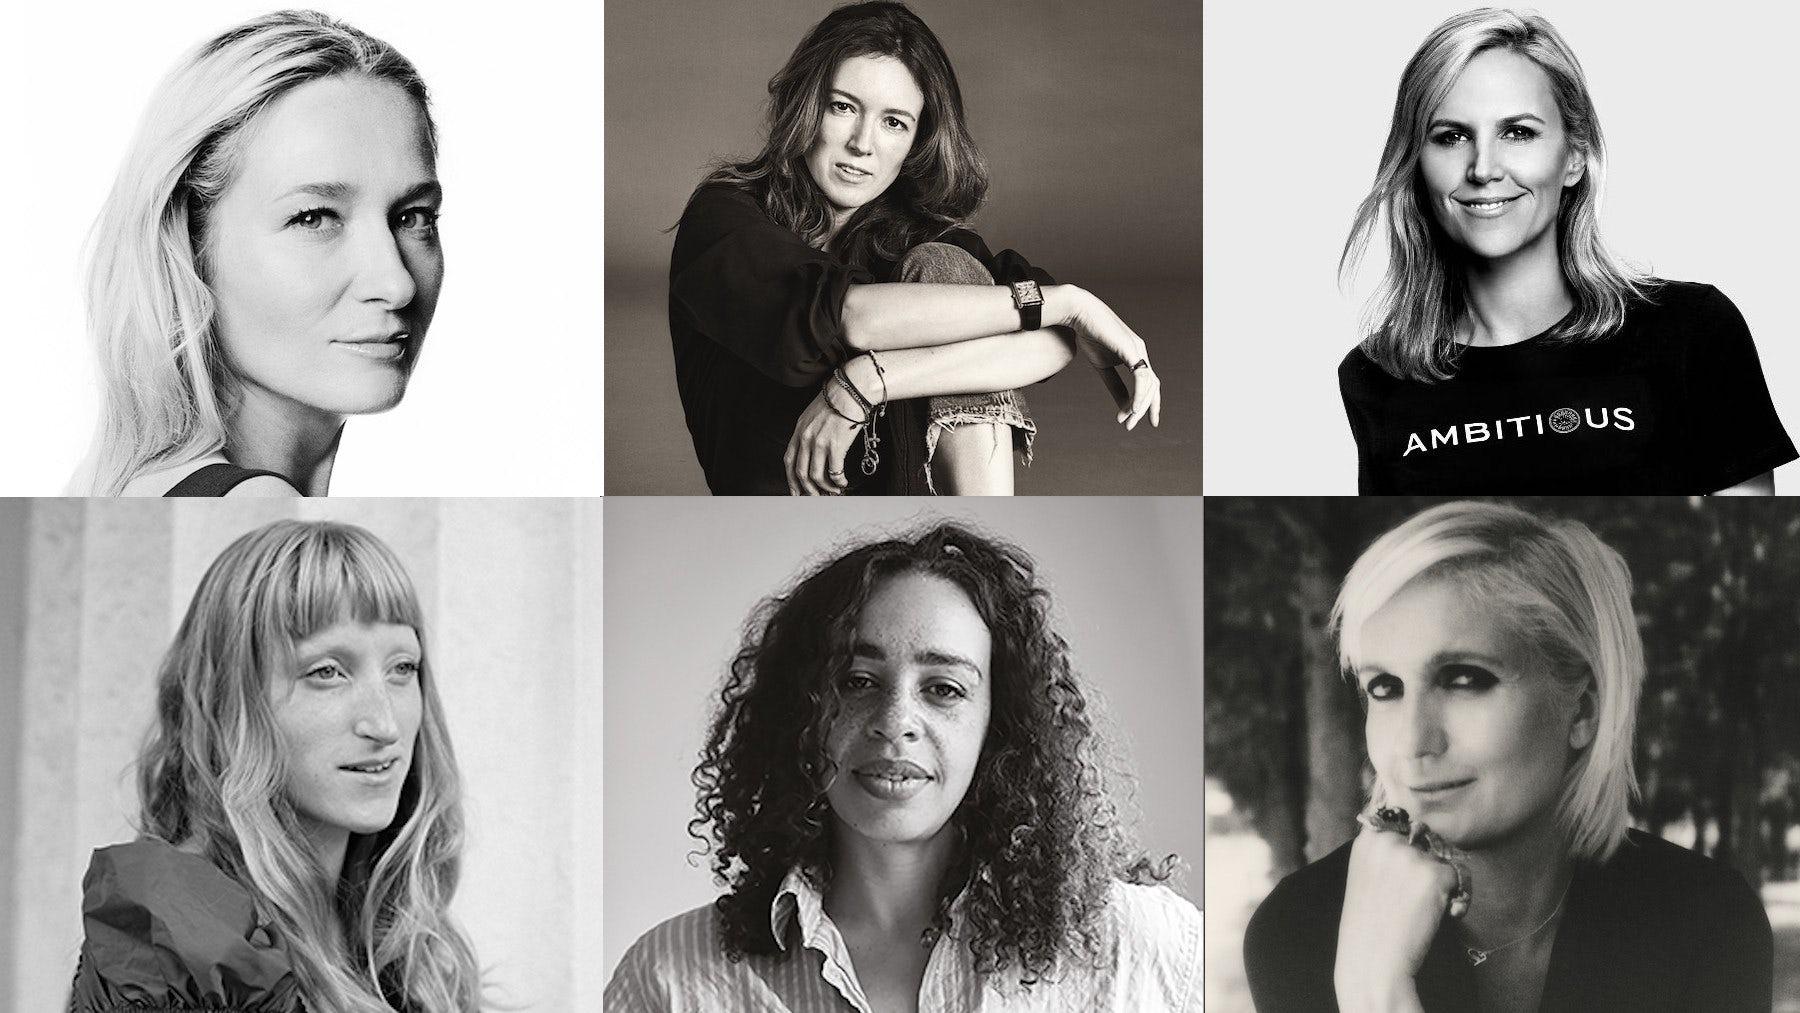 Clockwise from top left: Julie de Libran, Clare Waight Keller, Tory Burch, Maria Grazia Chiuri, Martine Rose, Molly Goddard